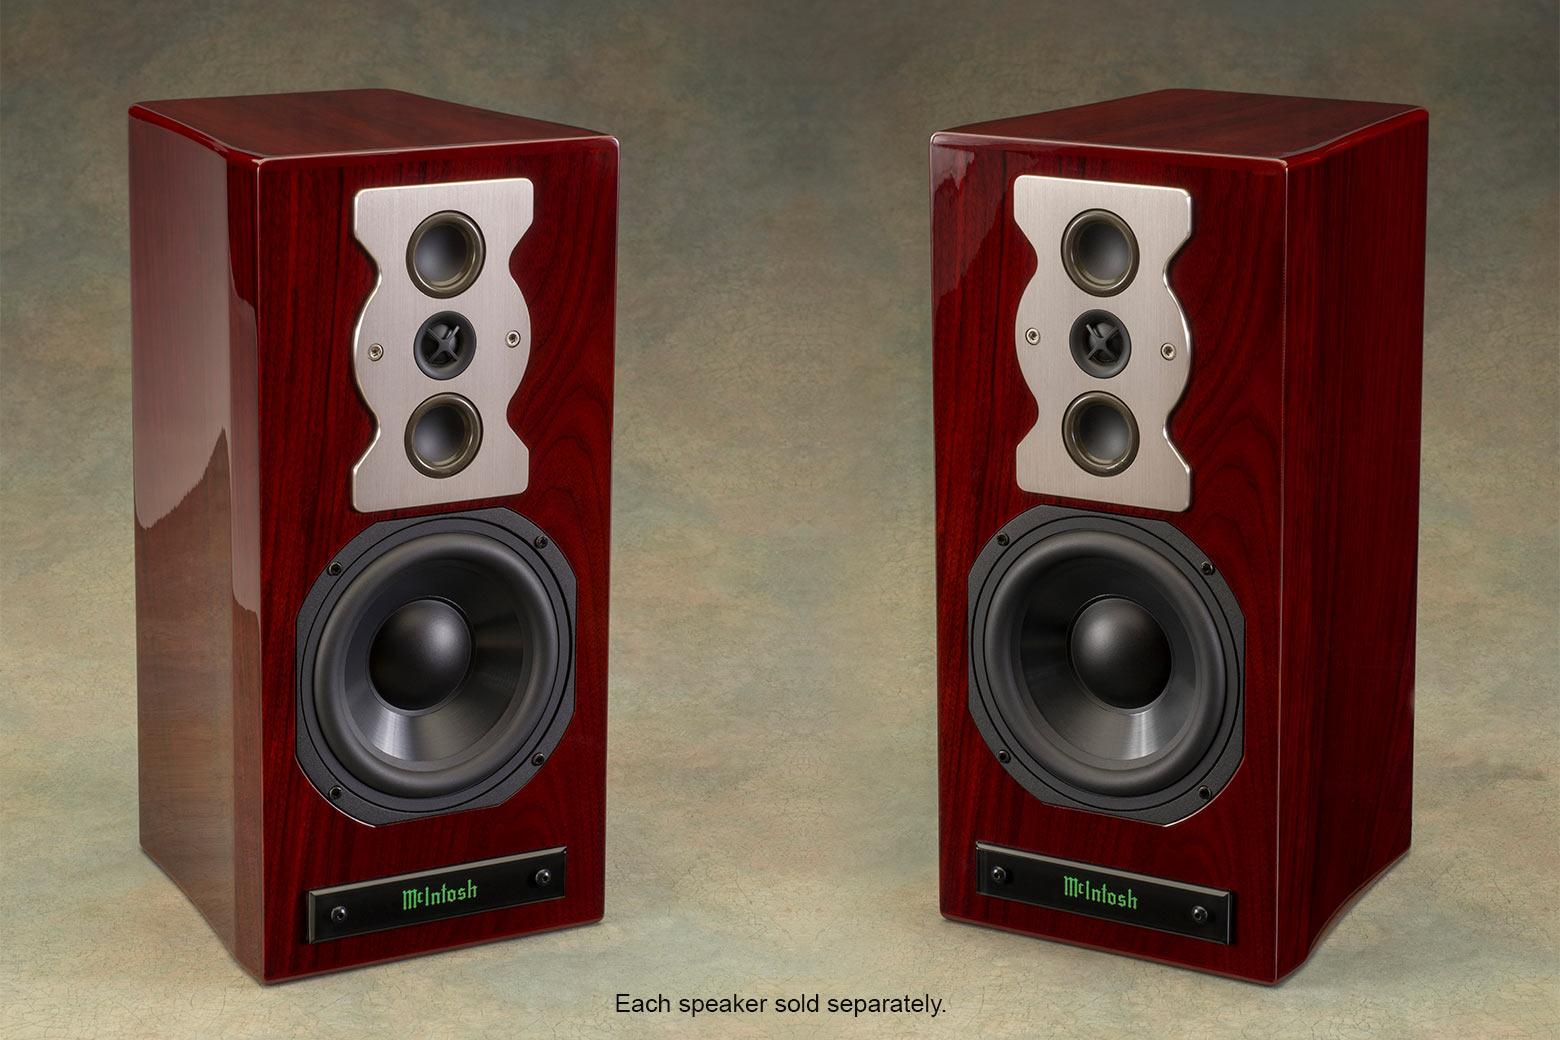 Mcintosh Xr50 3 Way Bookshelf Speaker Volume Control Wiring Diagram Further Loudspeaker